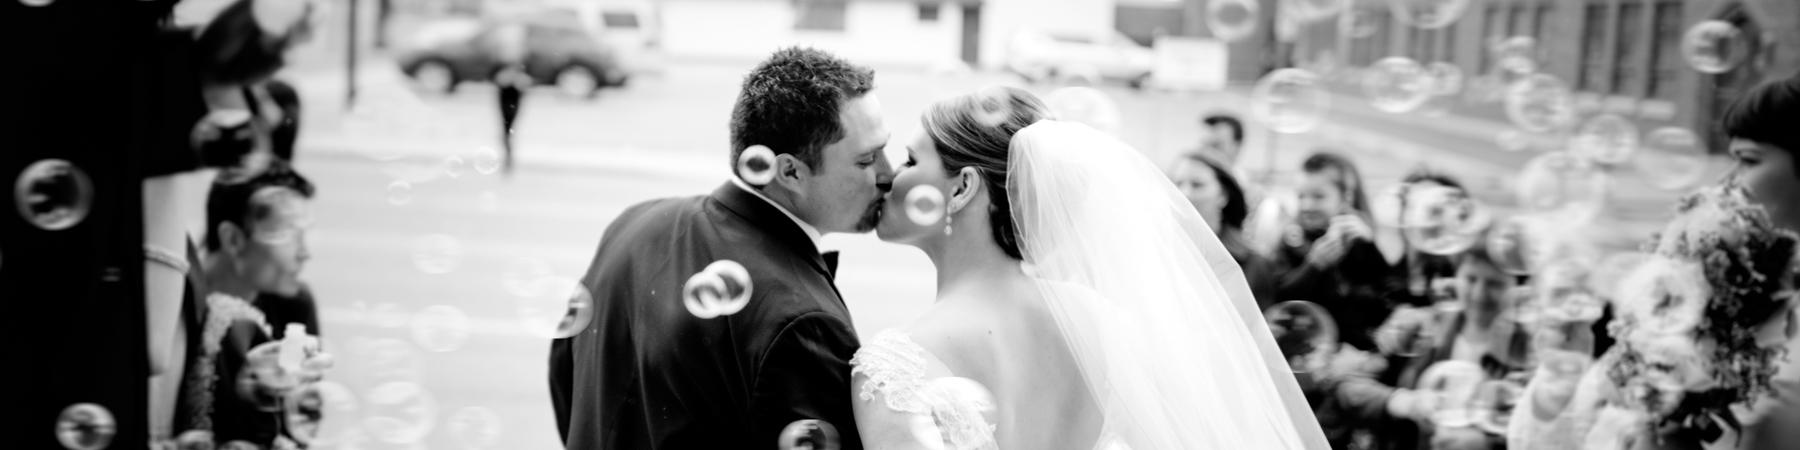 WEDDING DJ BRISBANE.jpg